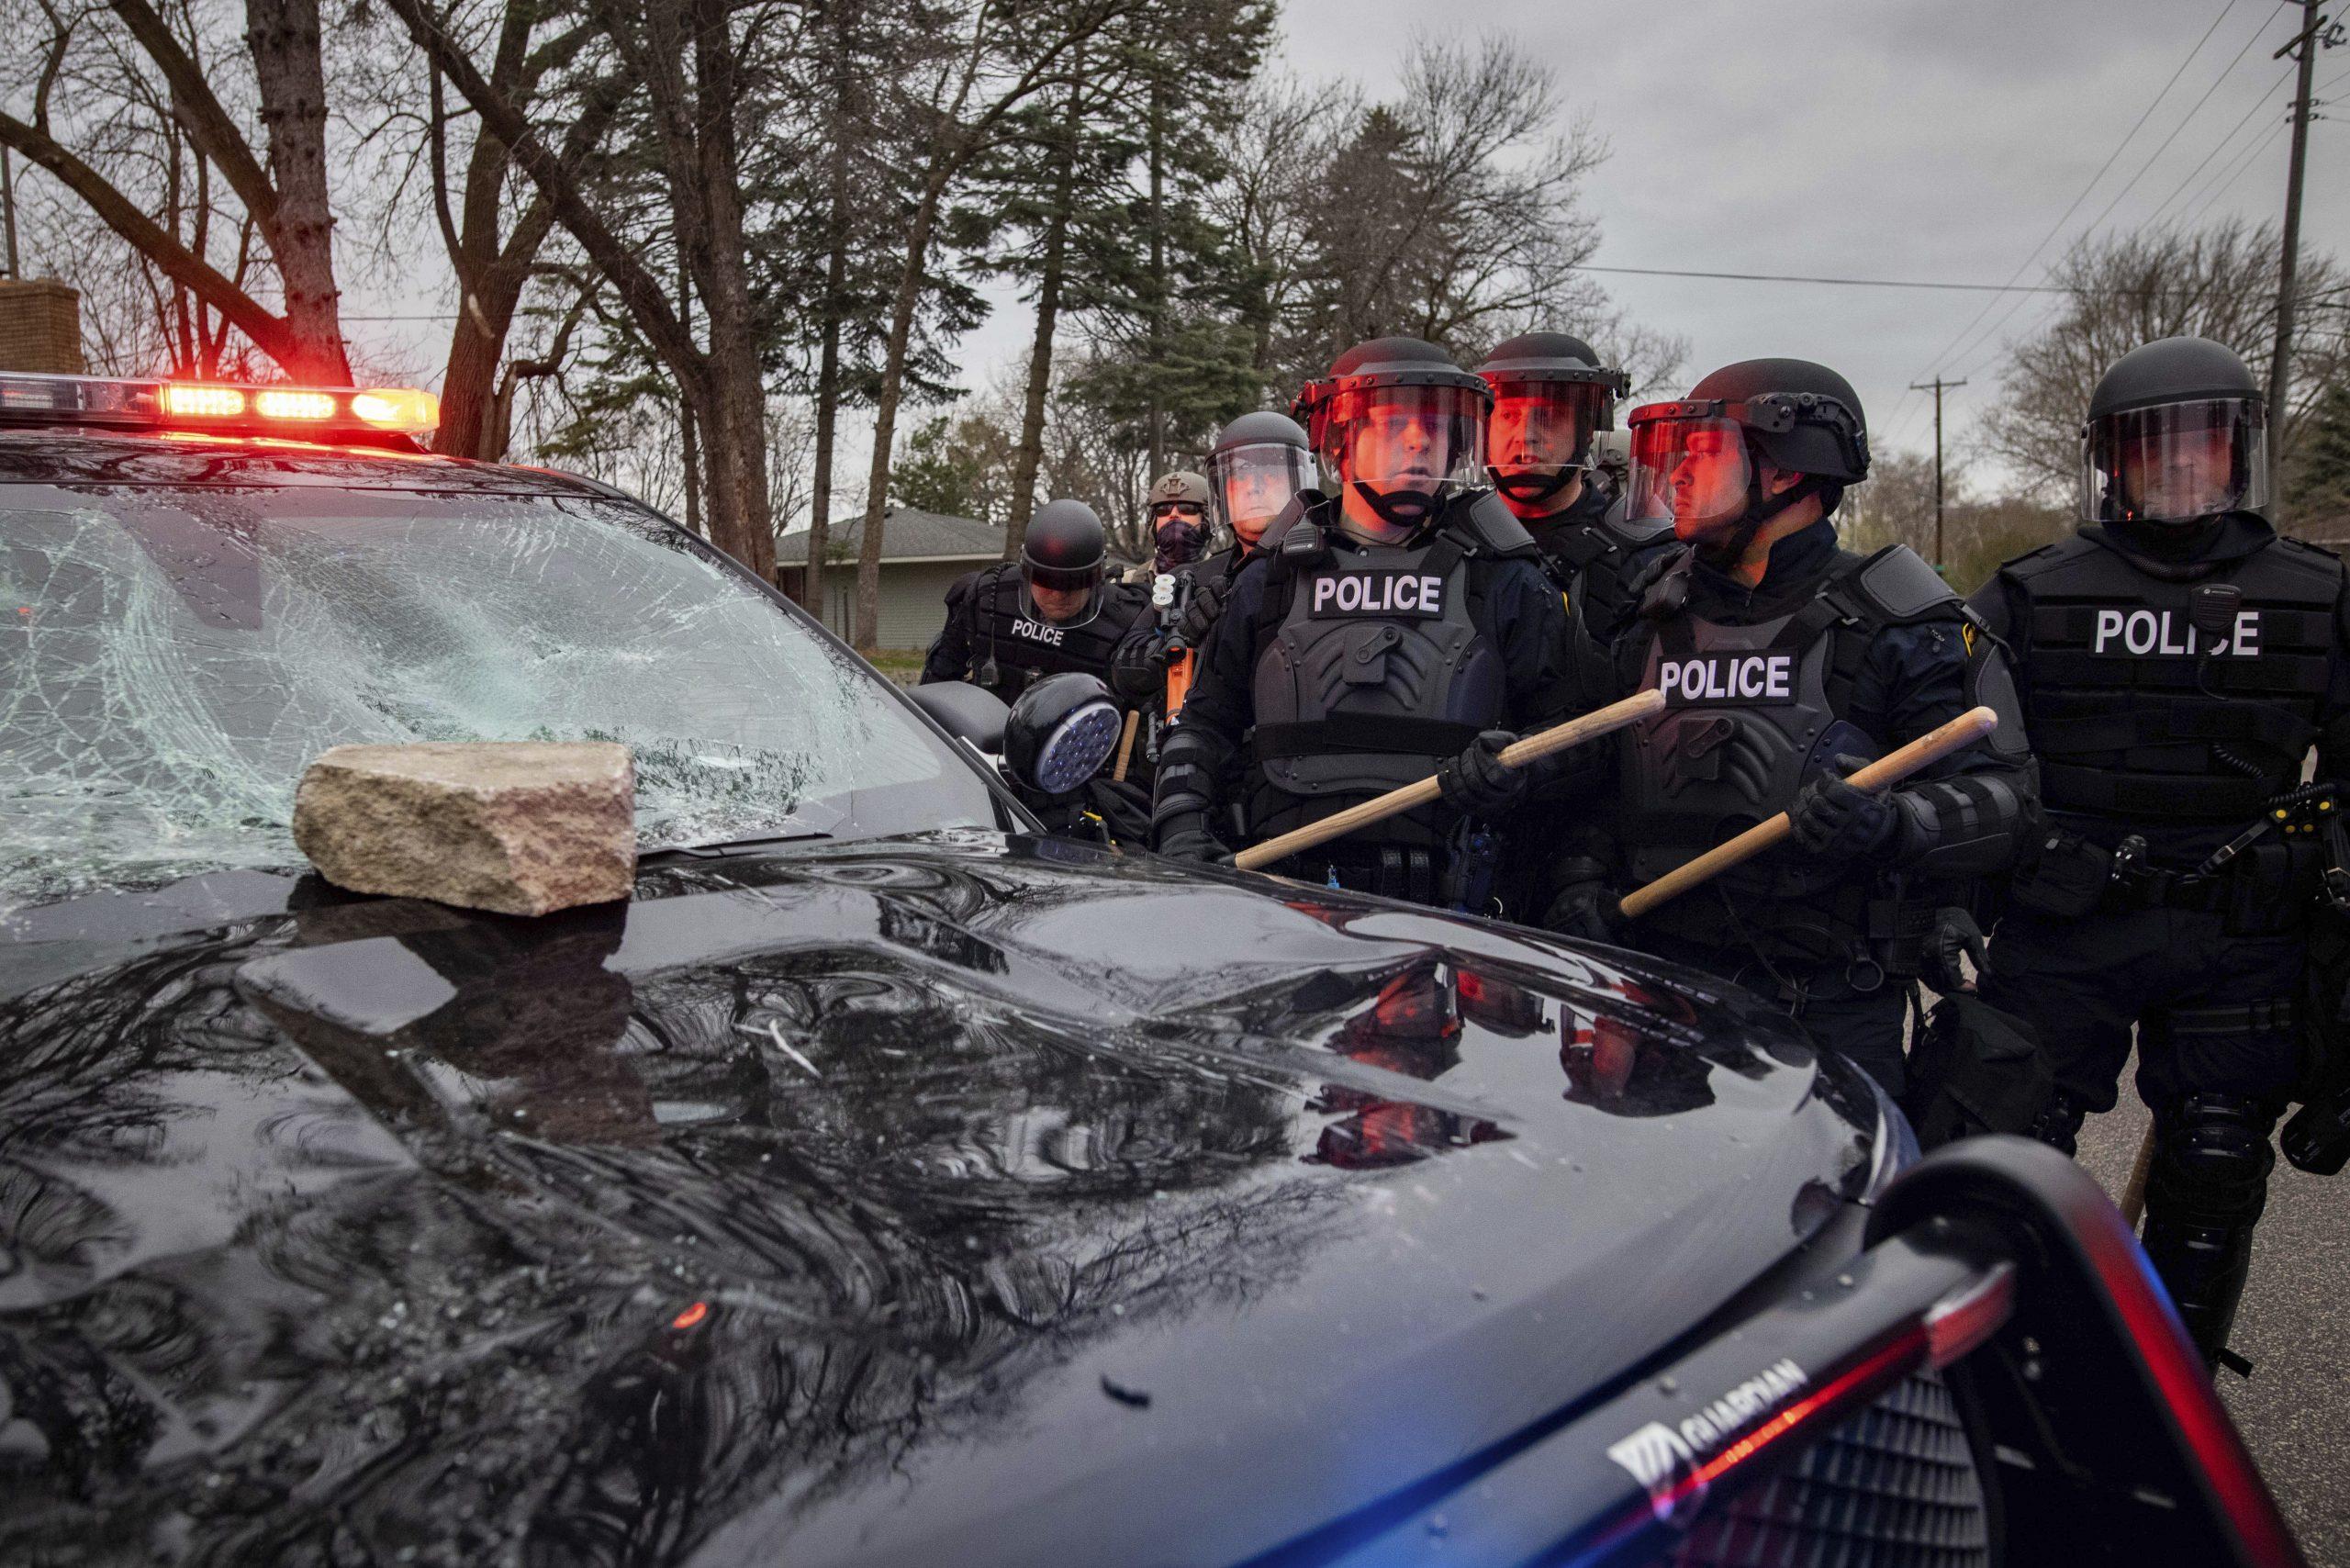 Protesti zbog smrti Afroamerikanca u Minesoti, policija tvrdi da je njen pripadnik slučajno pucao 1